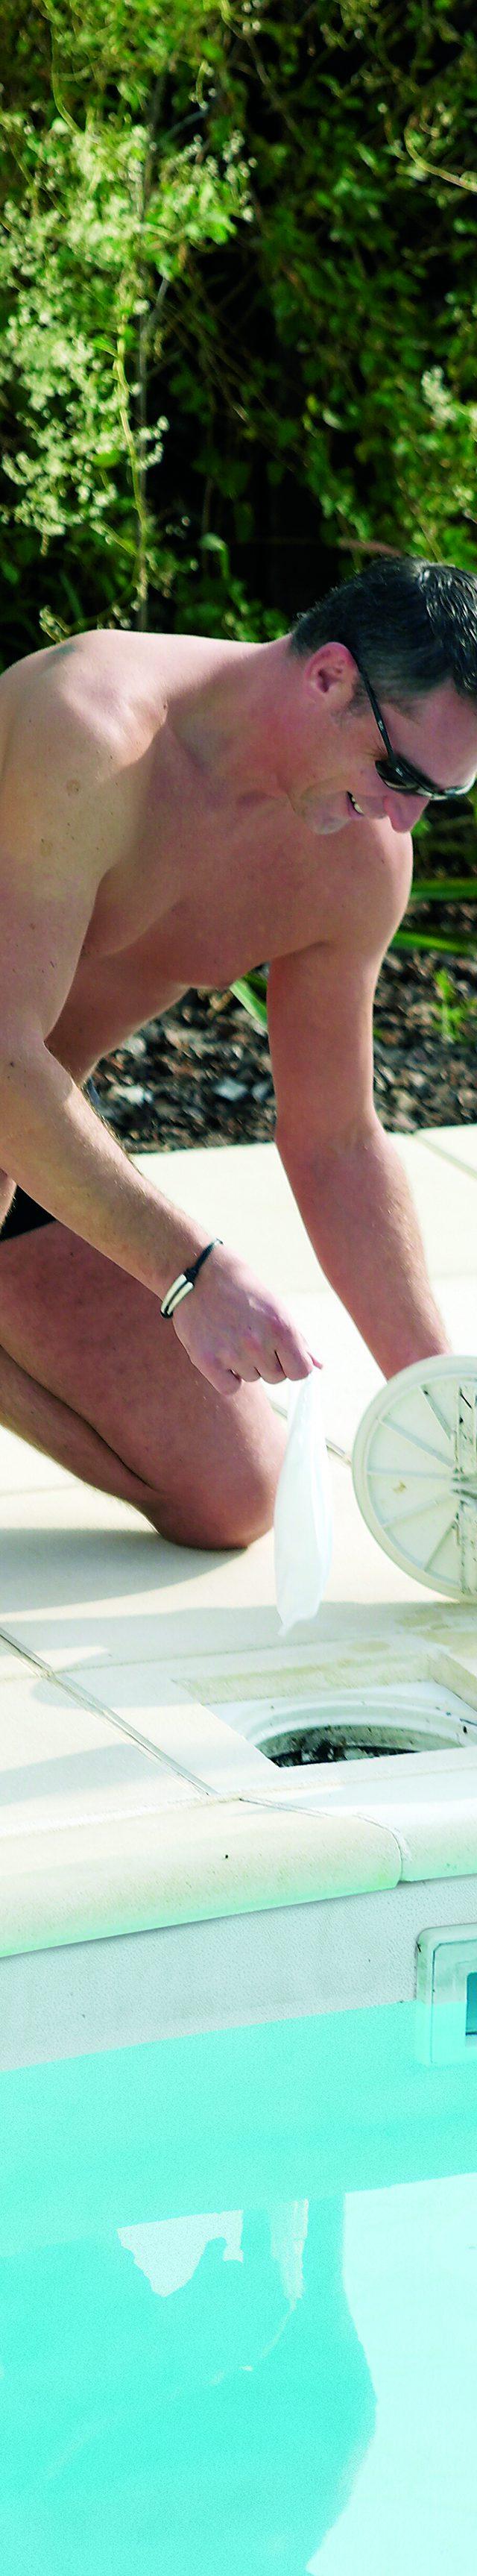 tratamento de piscinas